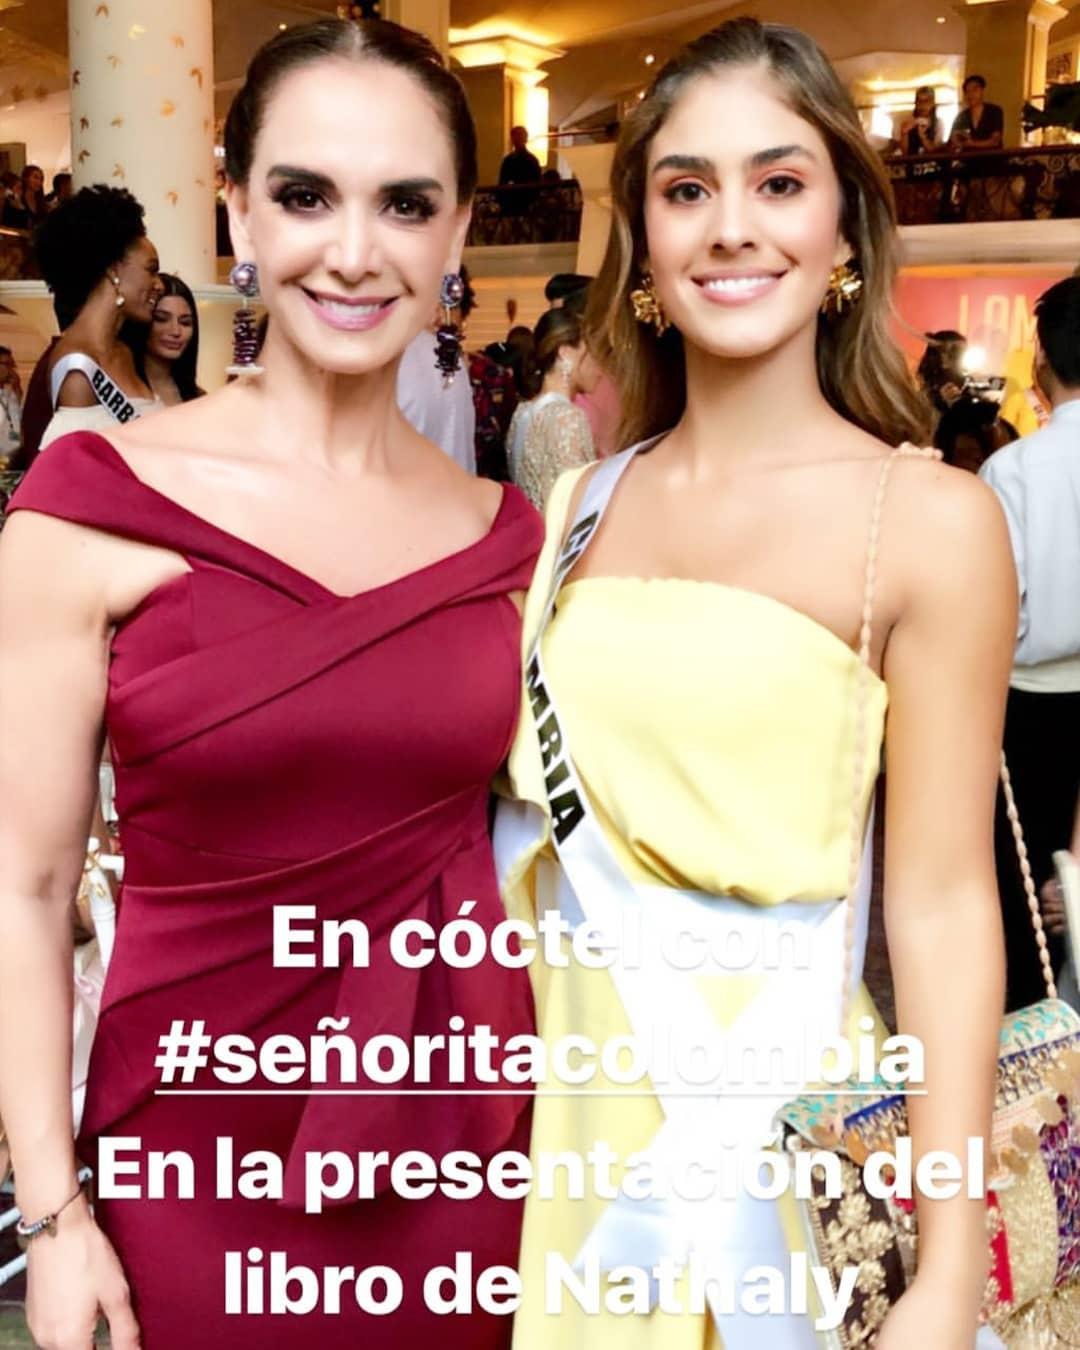 valeria morales, miss colombia universo 2018. - Página 18 Iynujb10